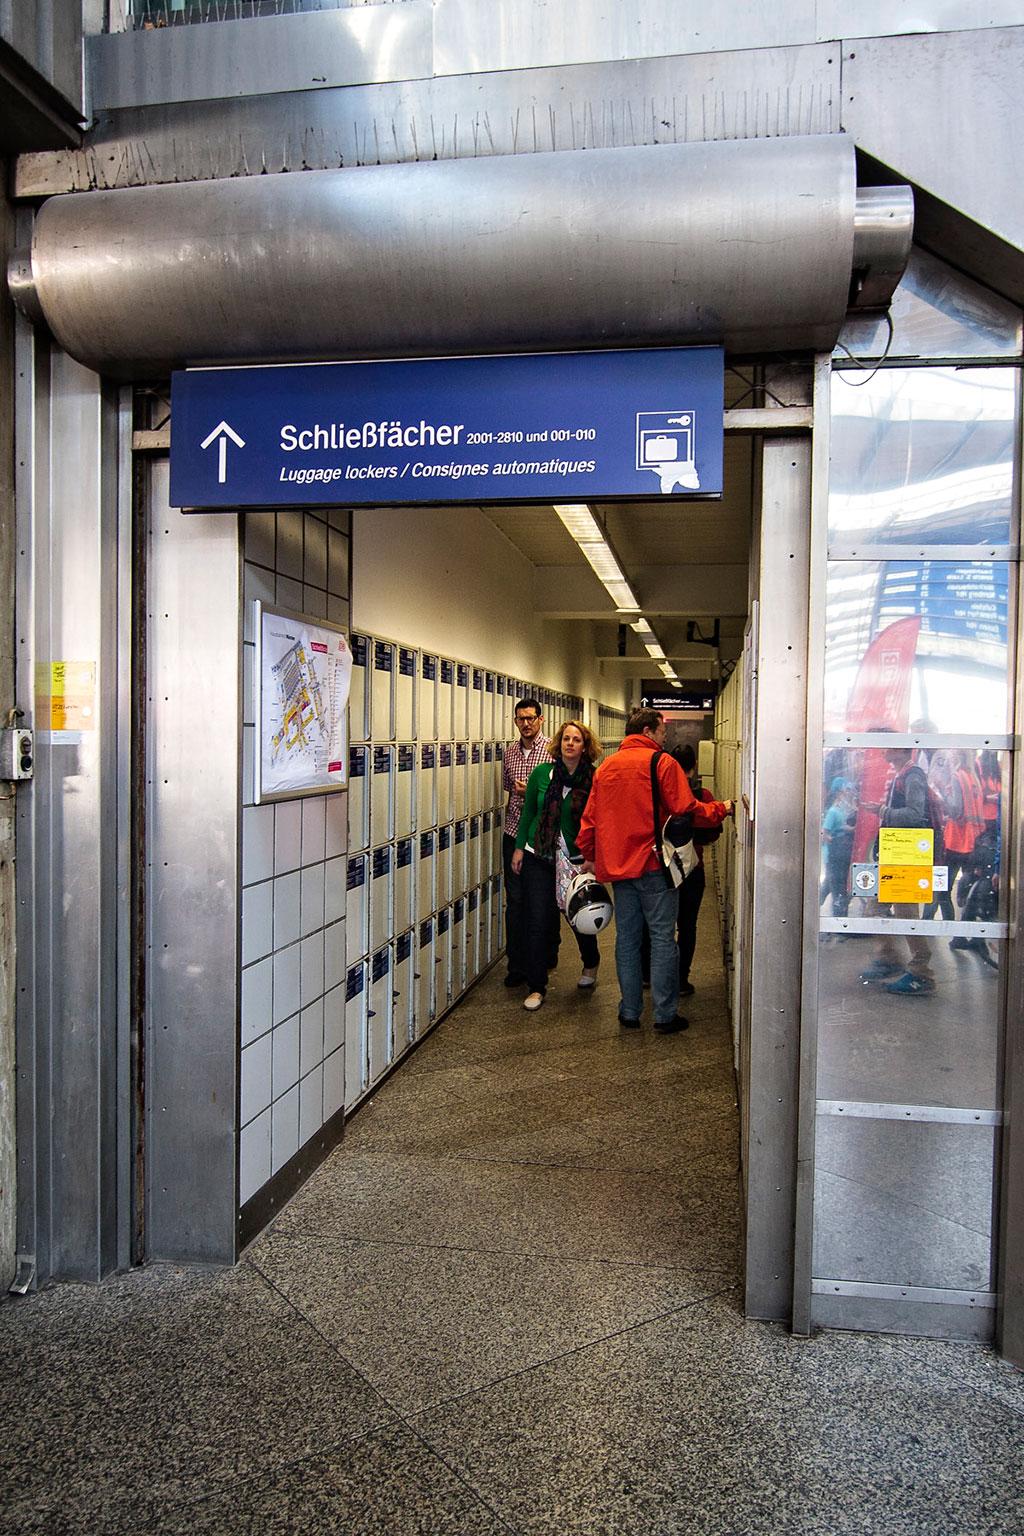 Munich Train Station Luggage Lockers